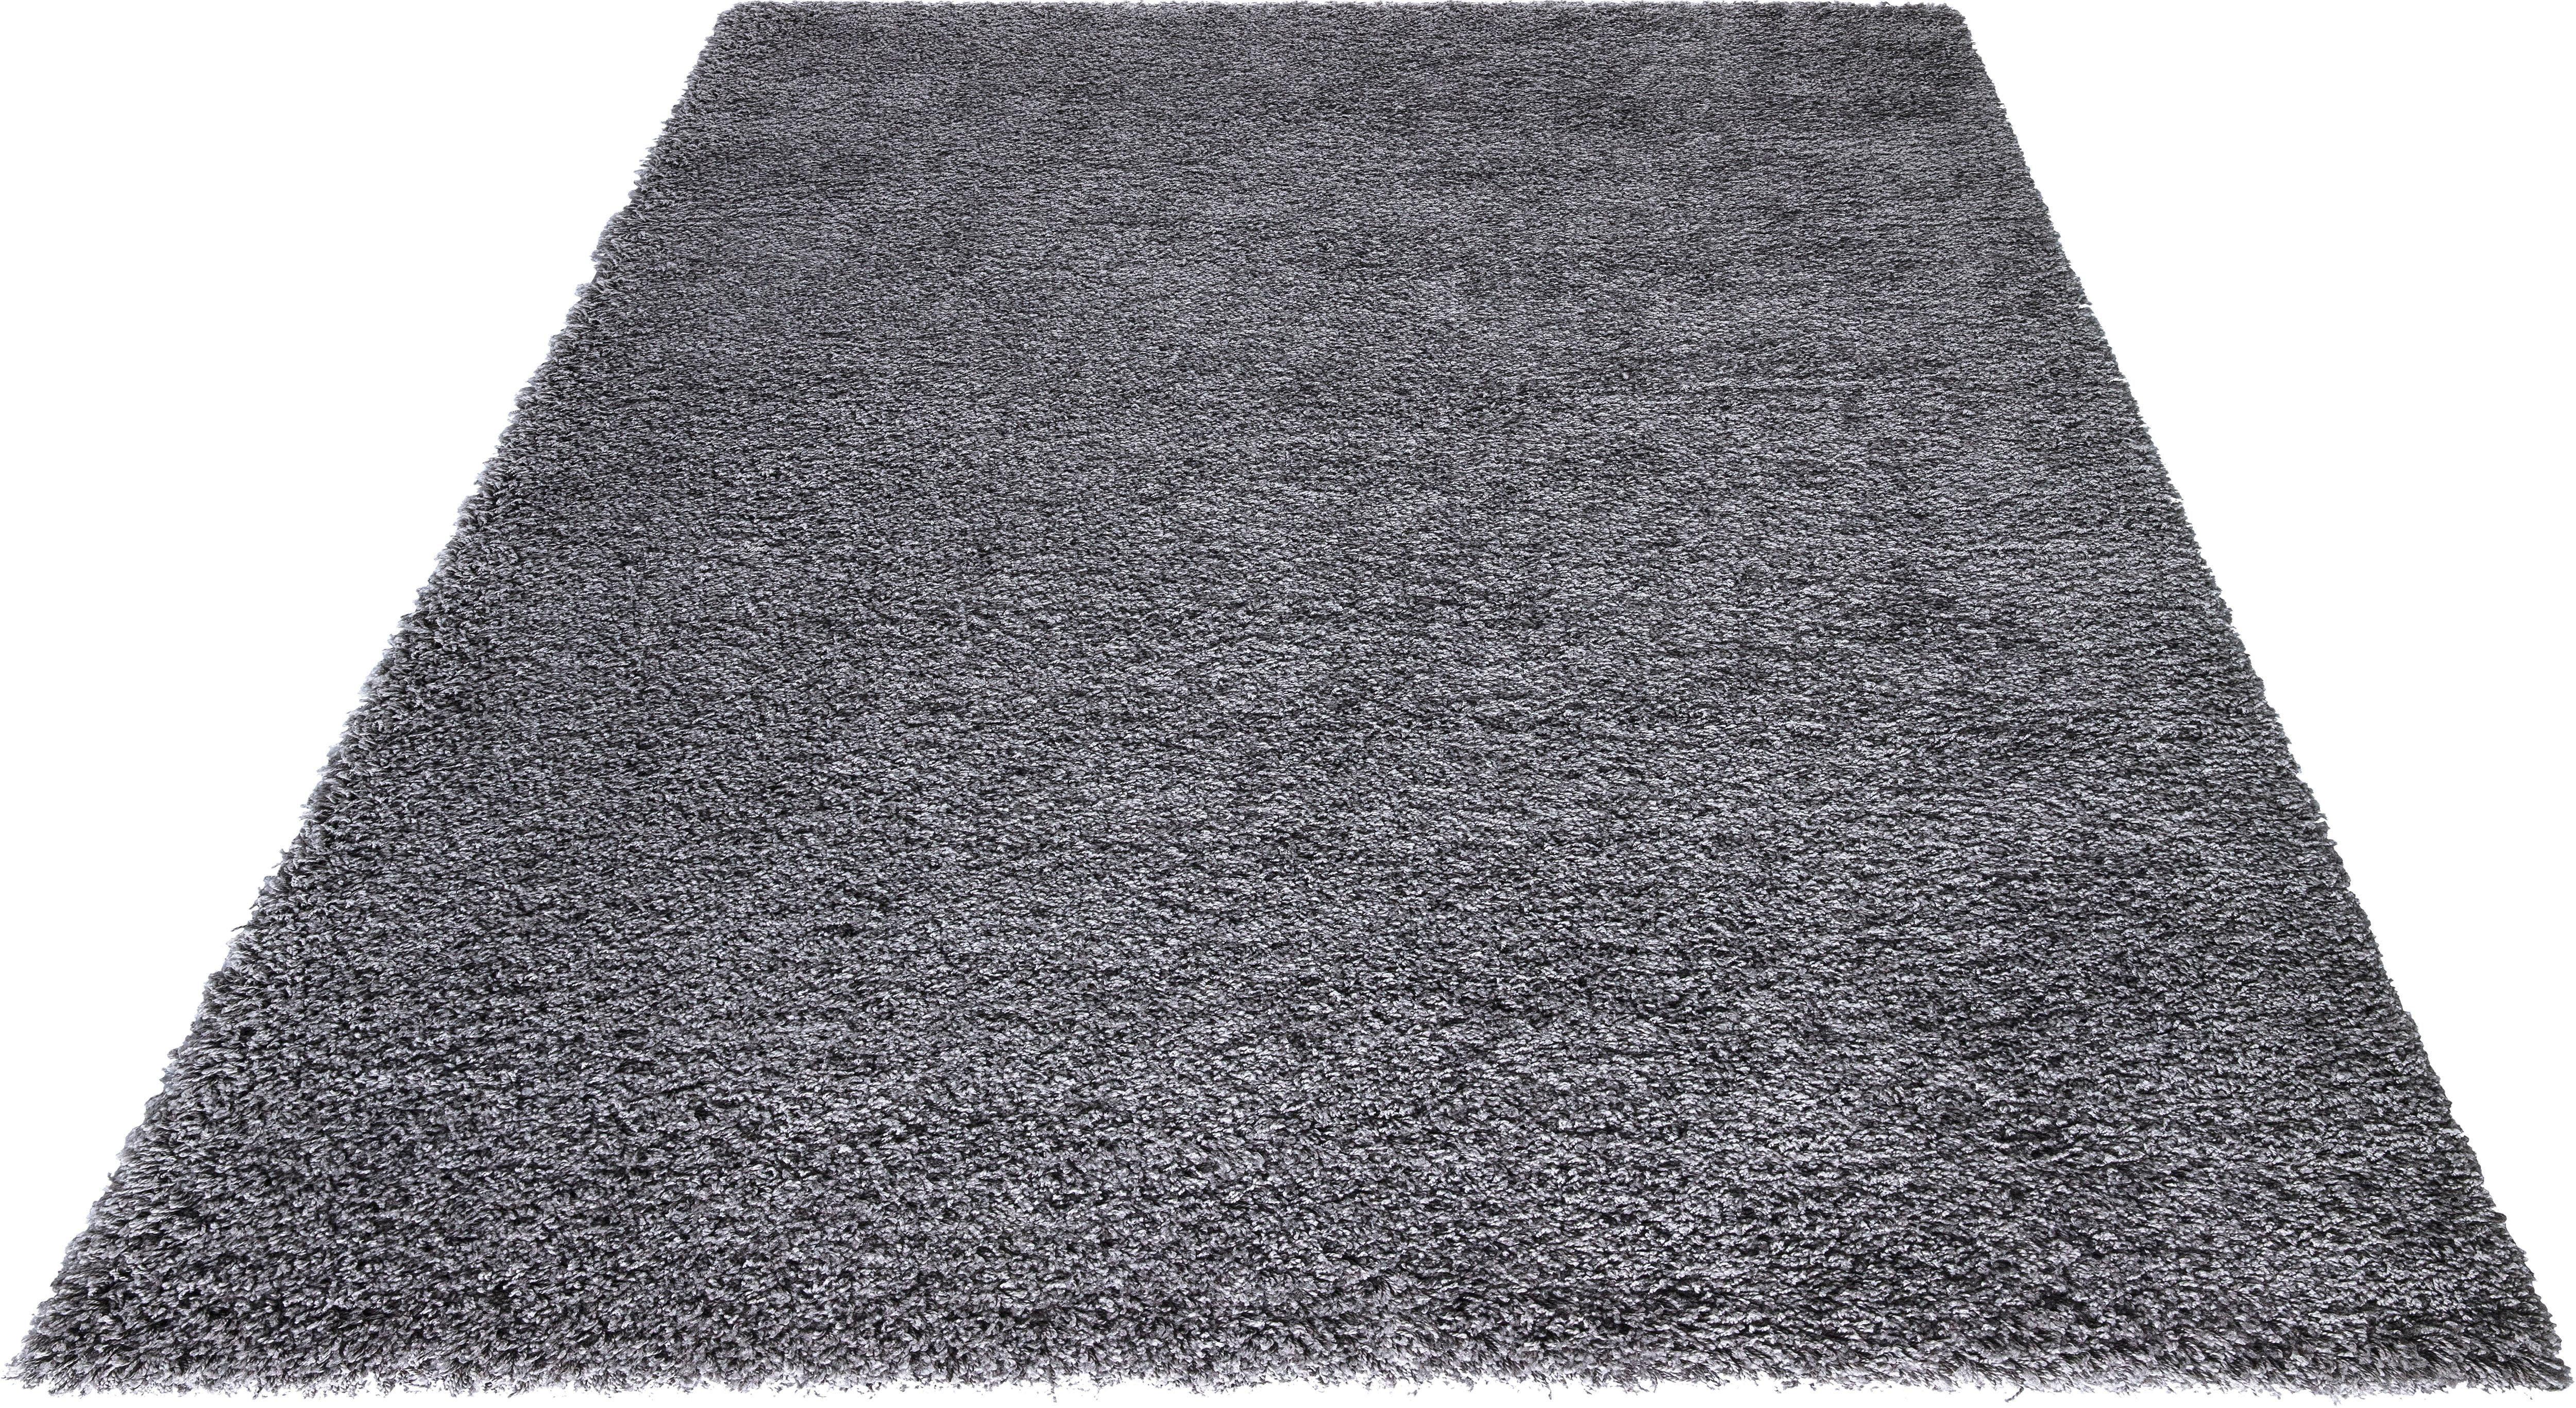 Hochflor-Teppich Neta OTTO products rechteckig Höhe 50 mm maschinell gewebt